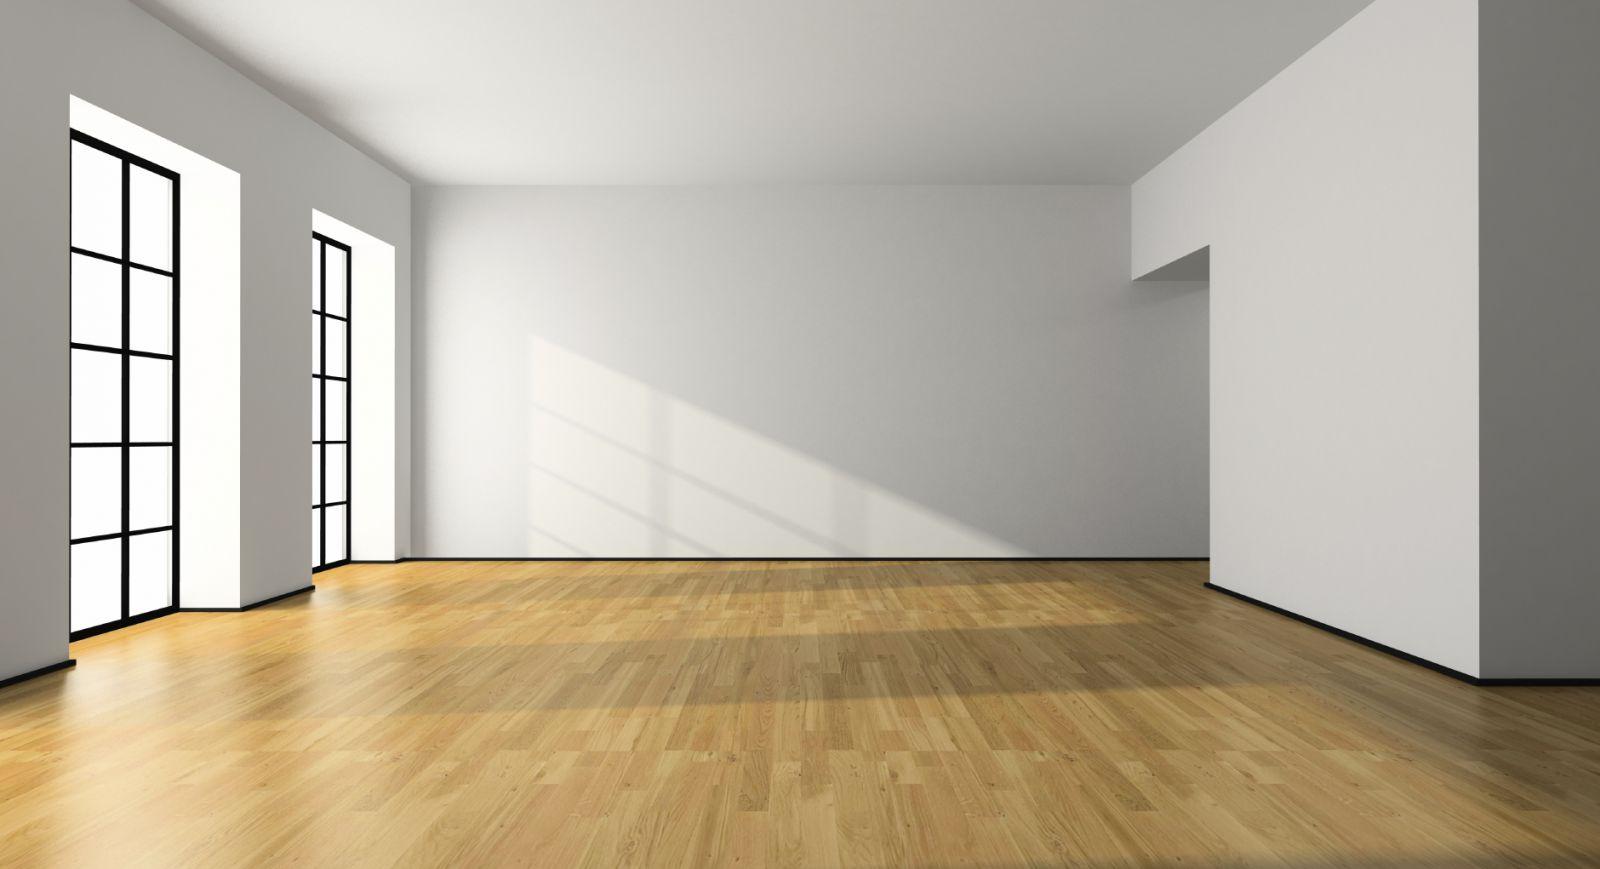 empty room wallpaper 1710x1226 - photo #6